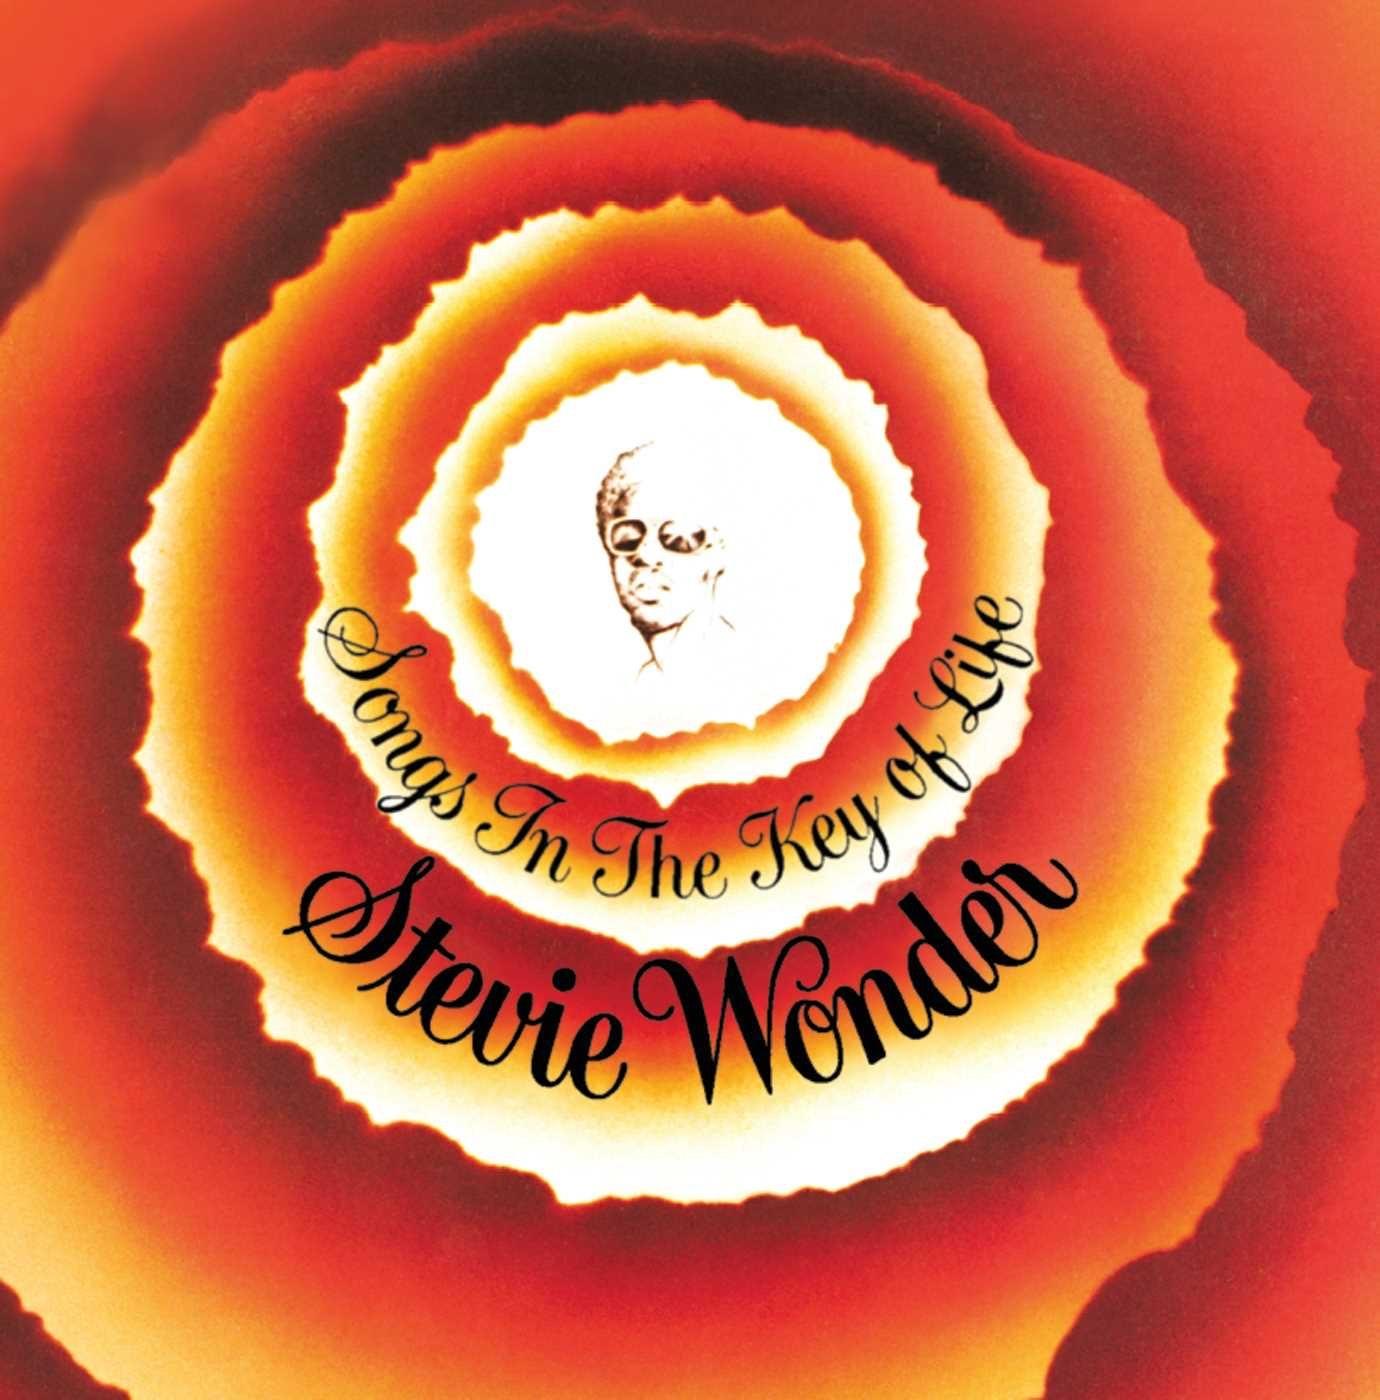 Stevie-Wonder-Song-in-the-Key-of-Life-1623962449